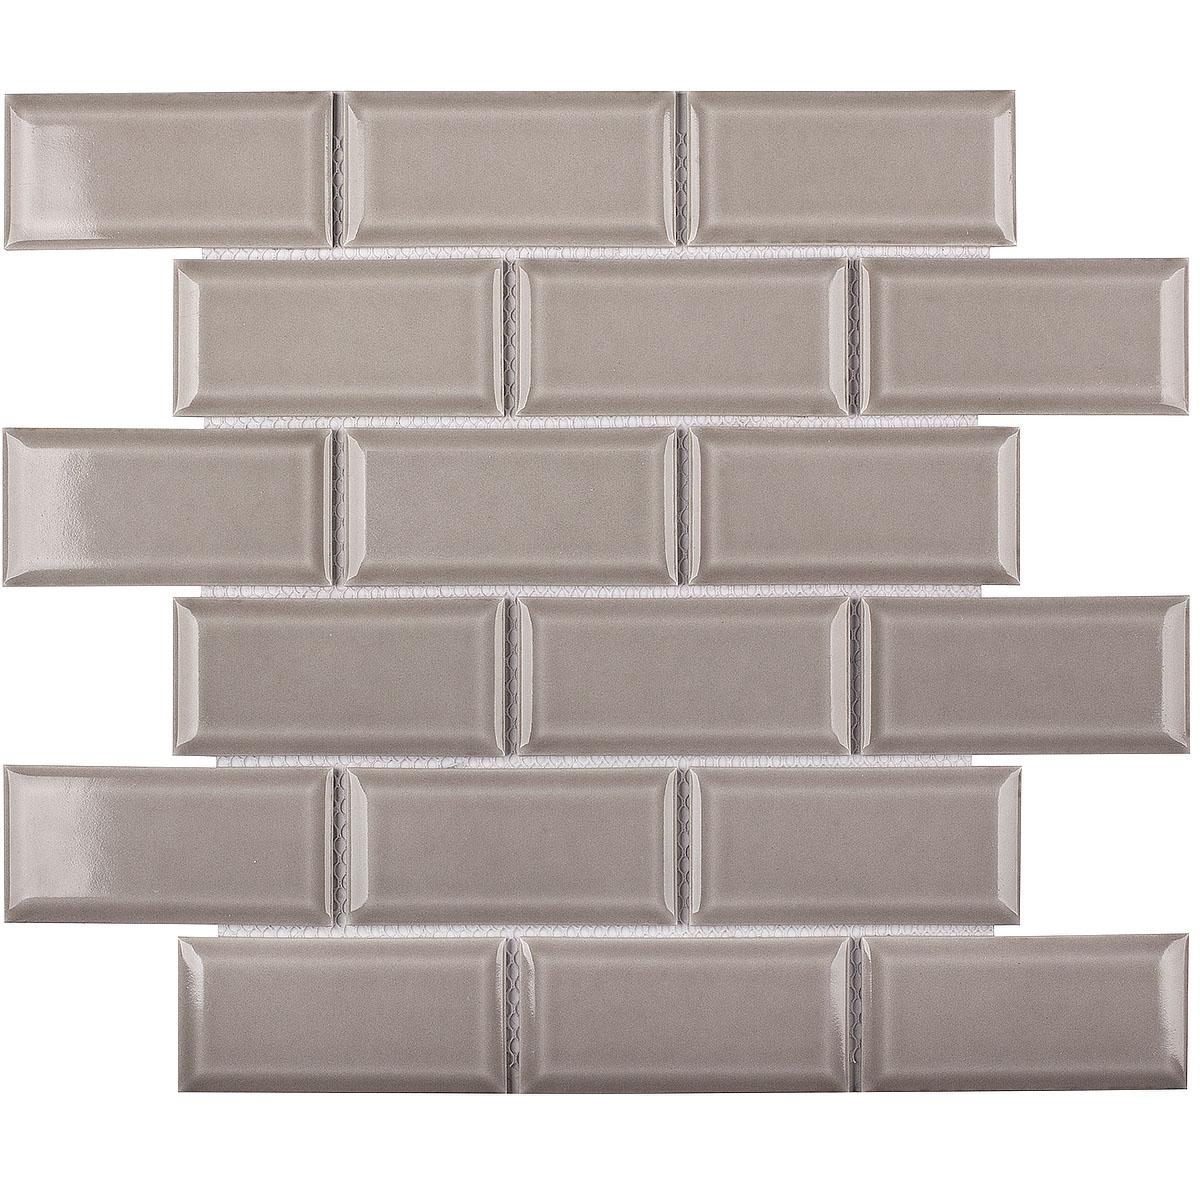 Керамическая мозаика Metro Grey Glossy 45х95 (AM81946) 291х295х6 на сетке из коллекции Brick & Metro.